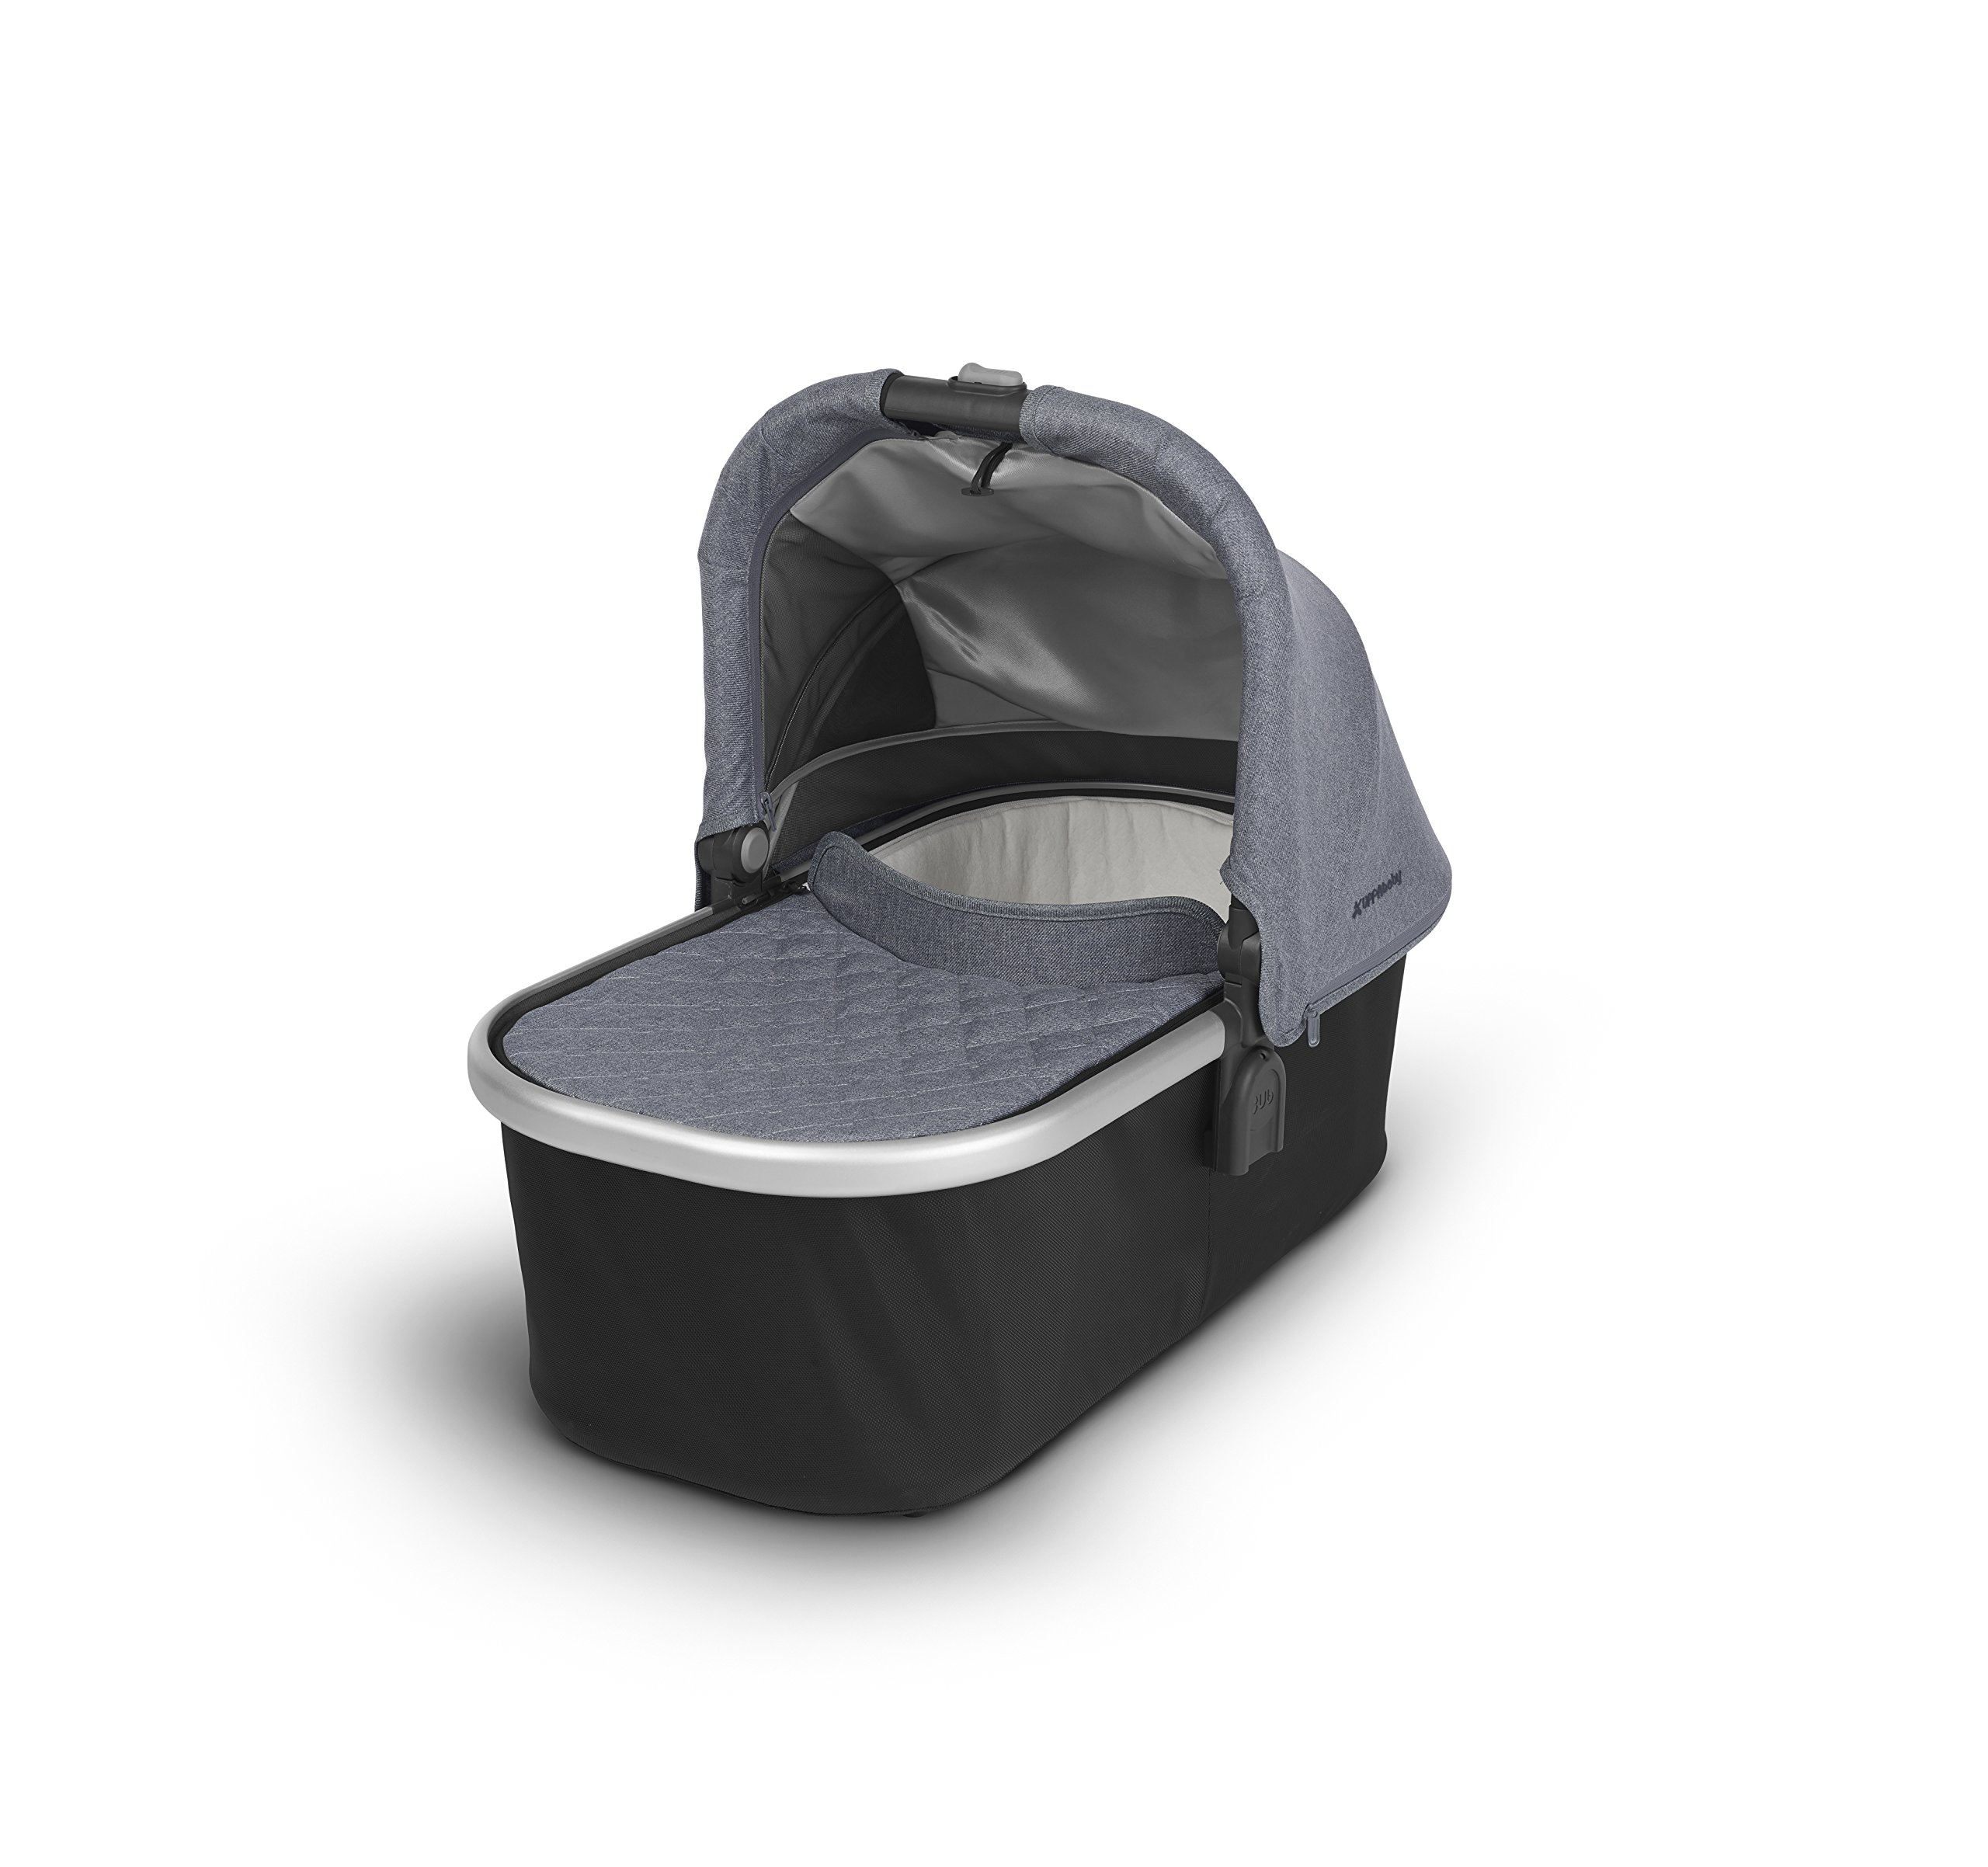 Amazon.com: 2018 UPPABaby CRUZ Stroller - Jake (Black/Carbon/Black ...